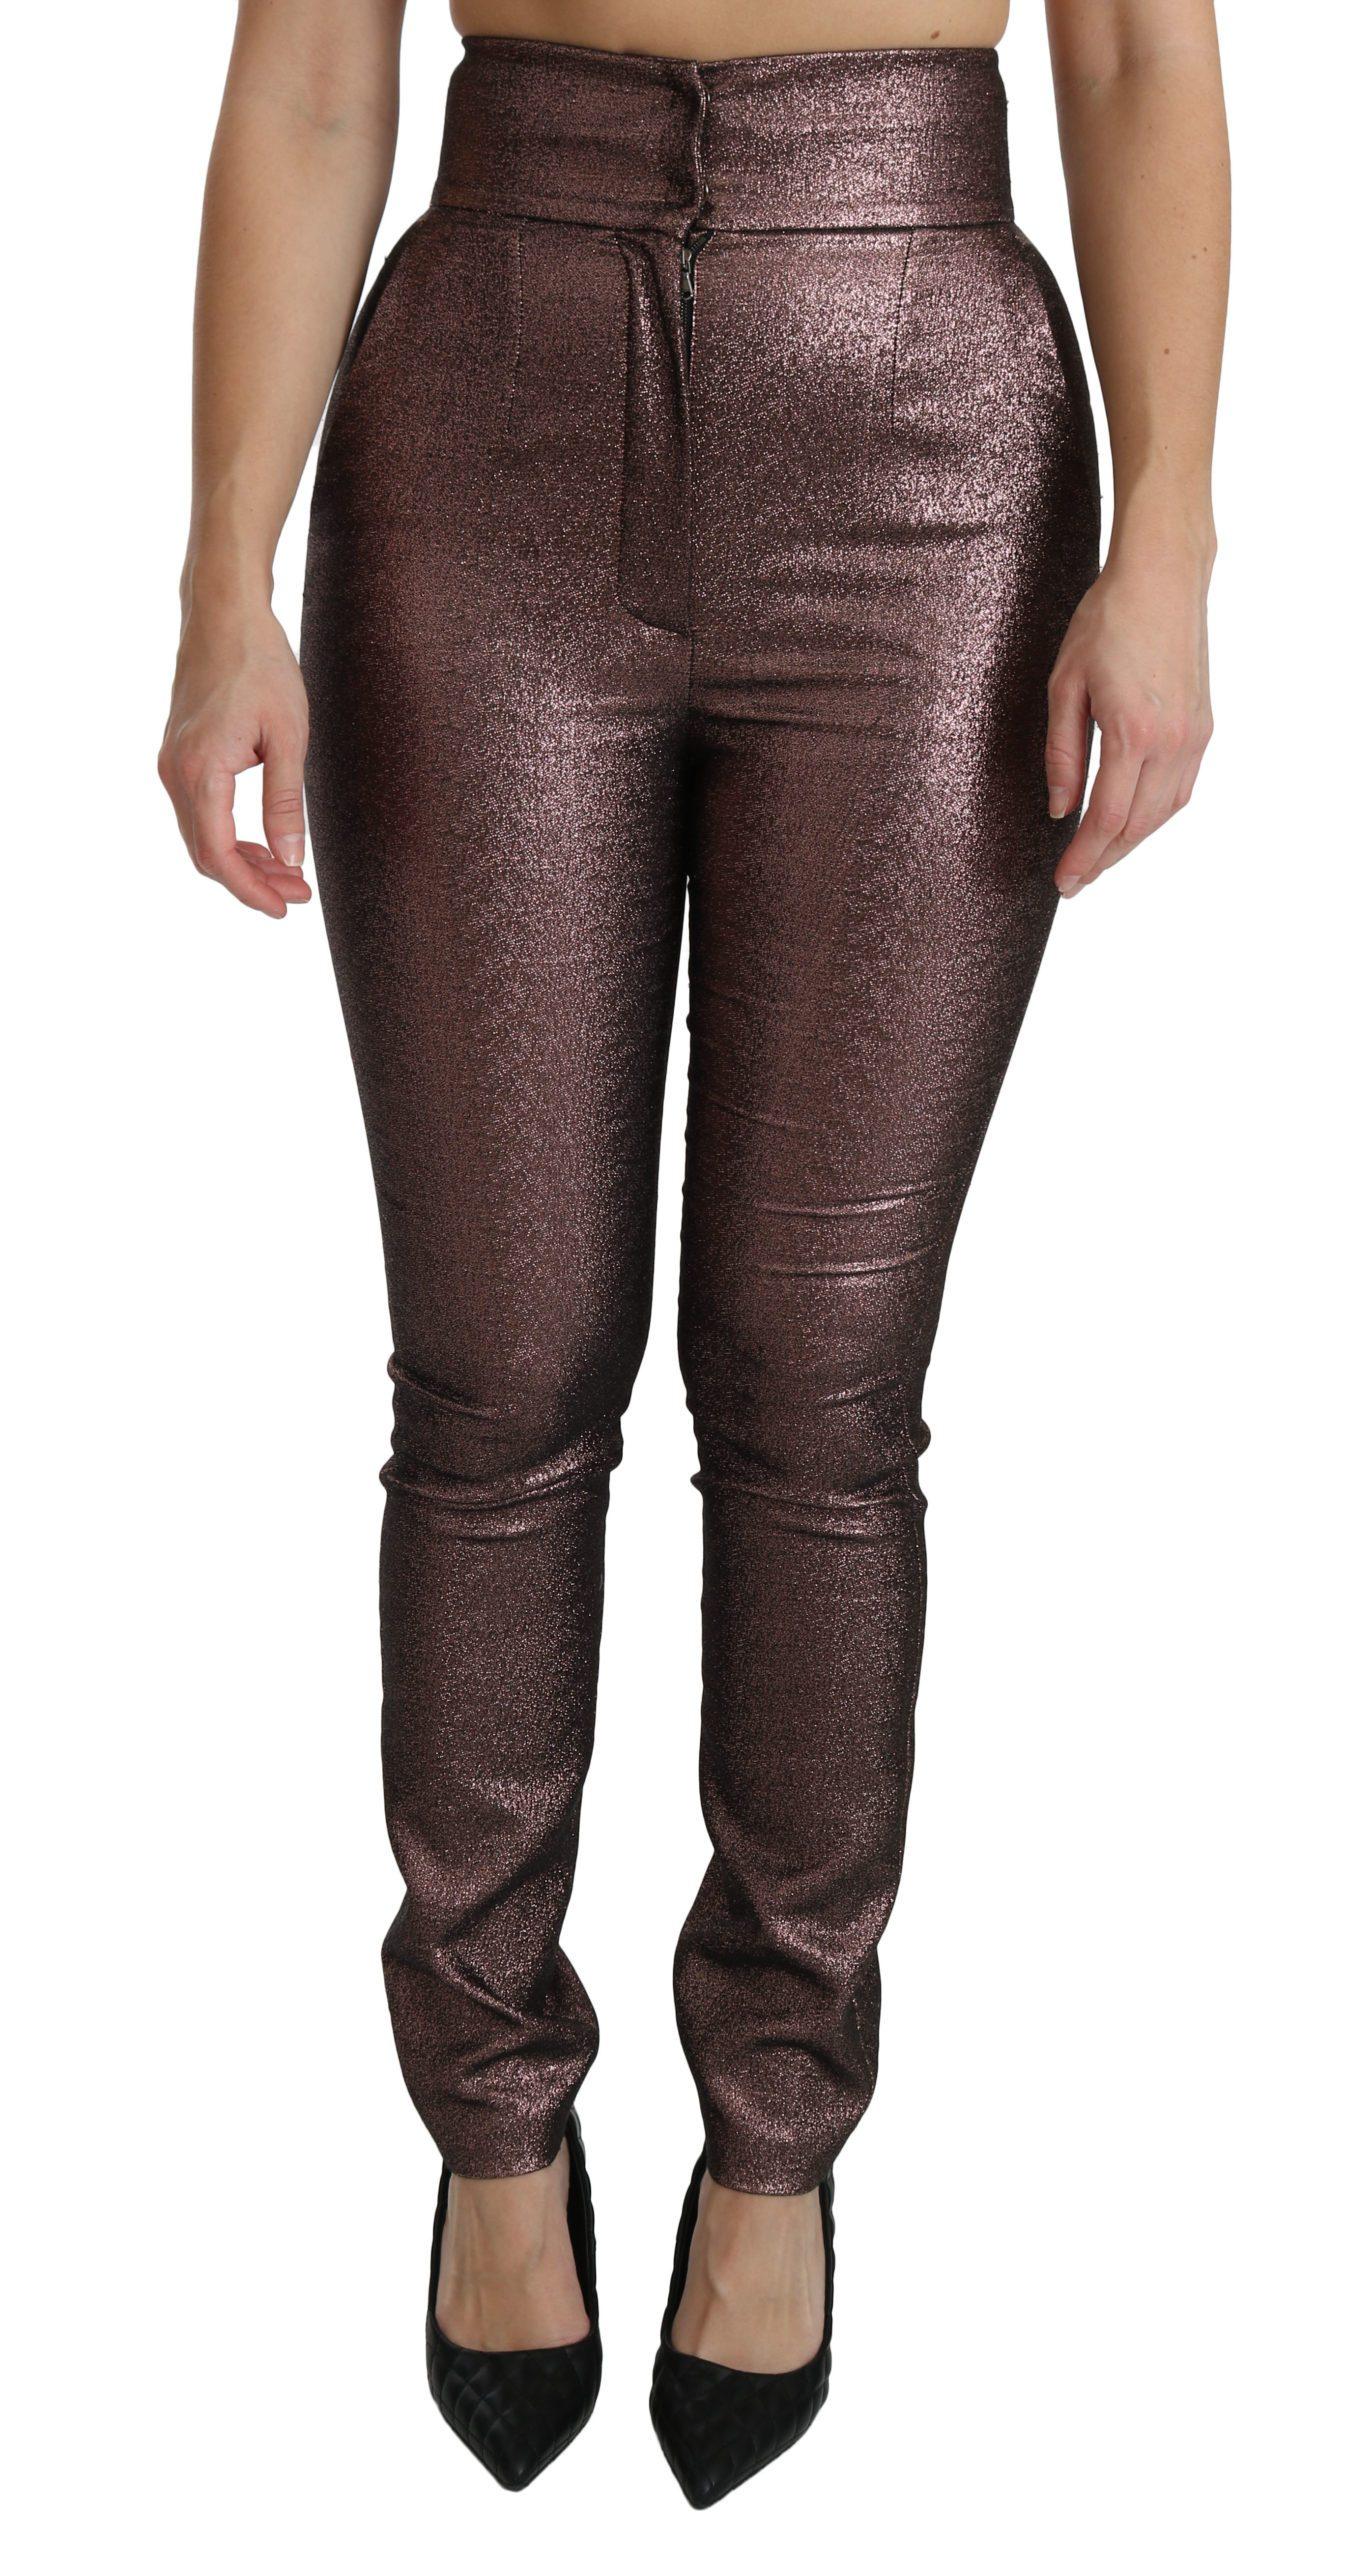 Dolce & Gabbana Women's Metallic High Waist Skinny Cotton Trouser Purple PAN70874 - IT40 S